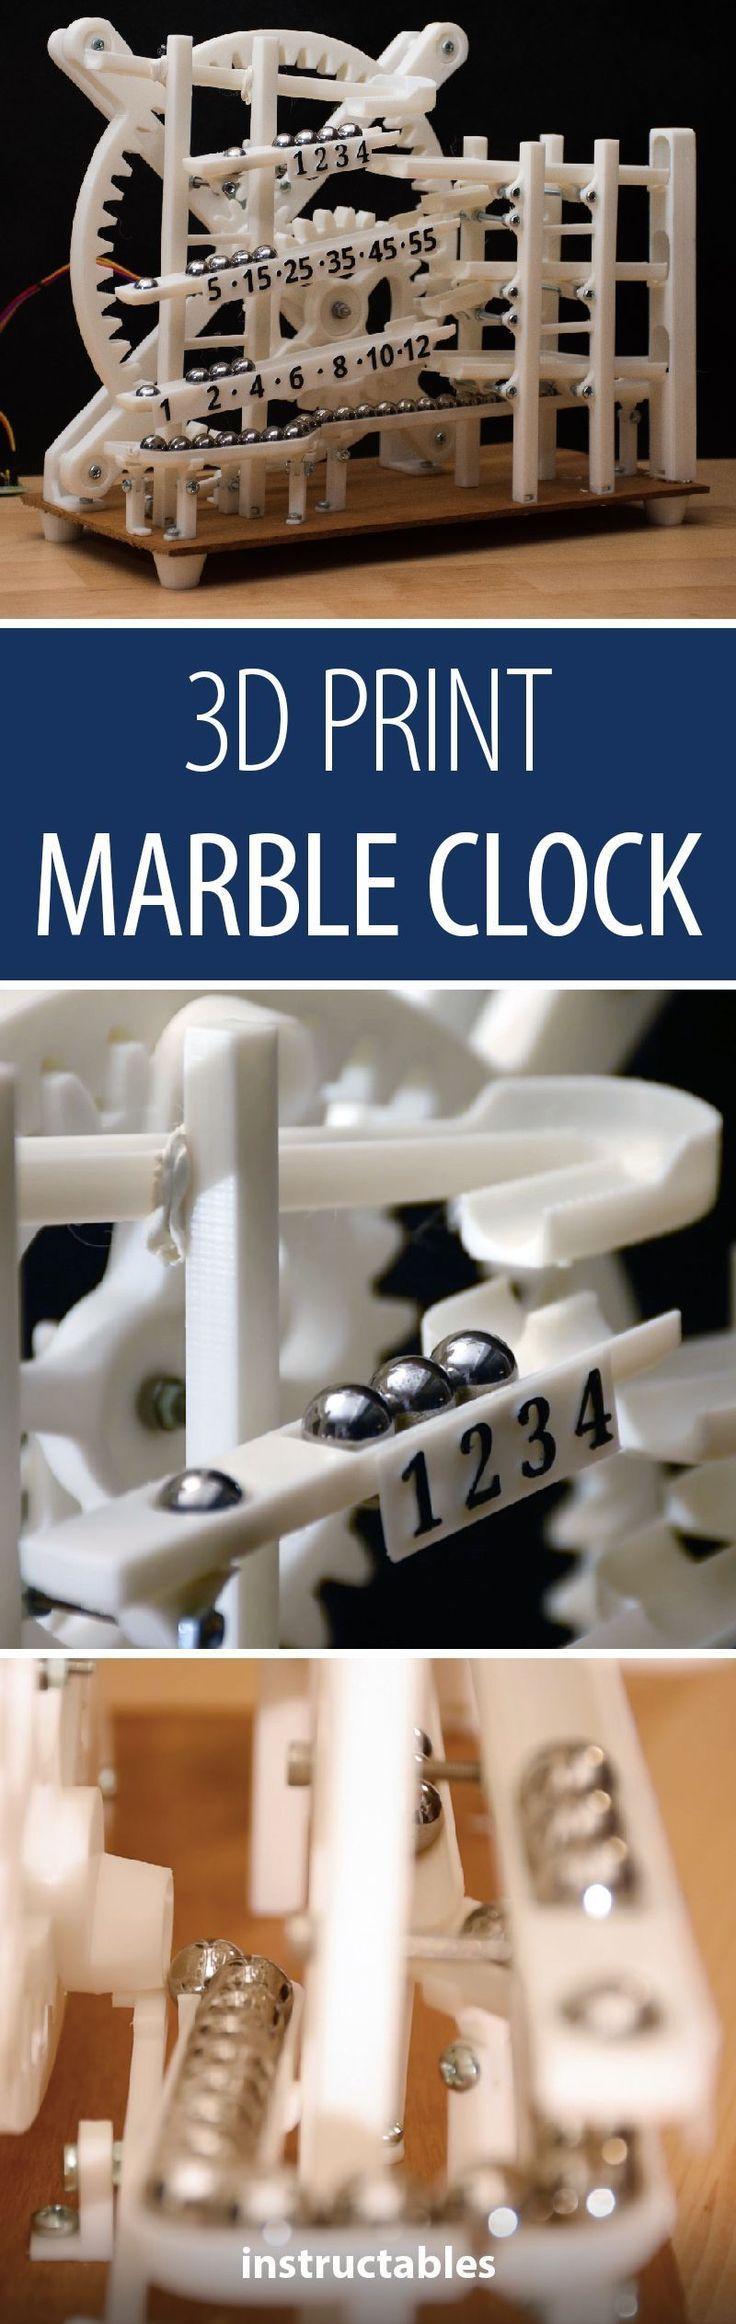 Marble Clock Clock Marble Robot Marble Clock 3d Printing 3d Printer Designs